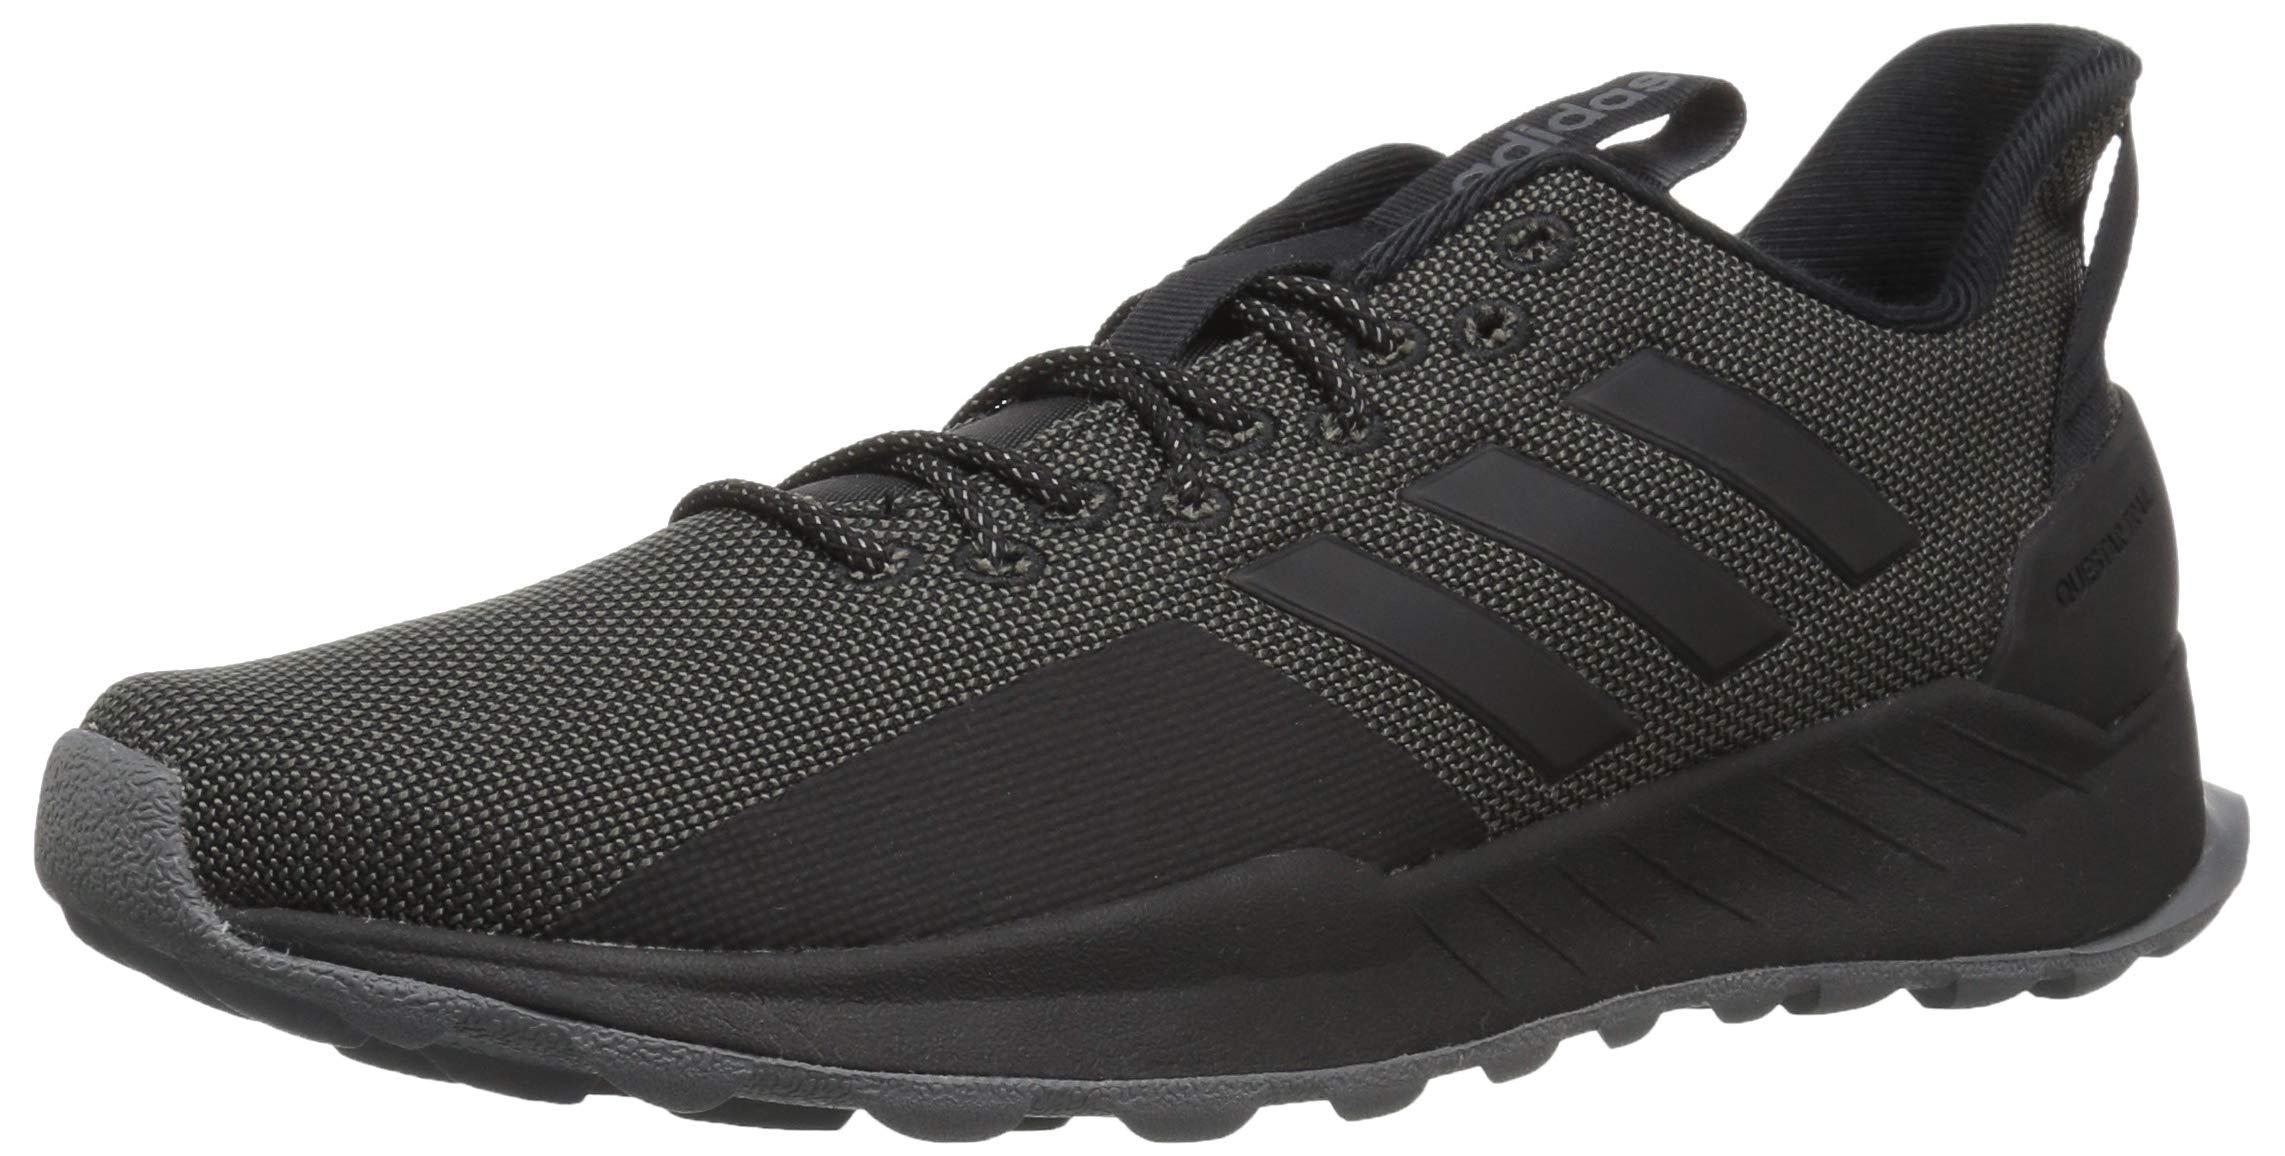 adidas Questar Trail Running Black